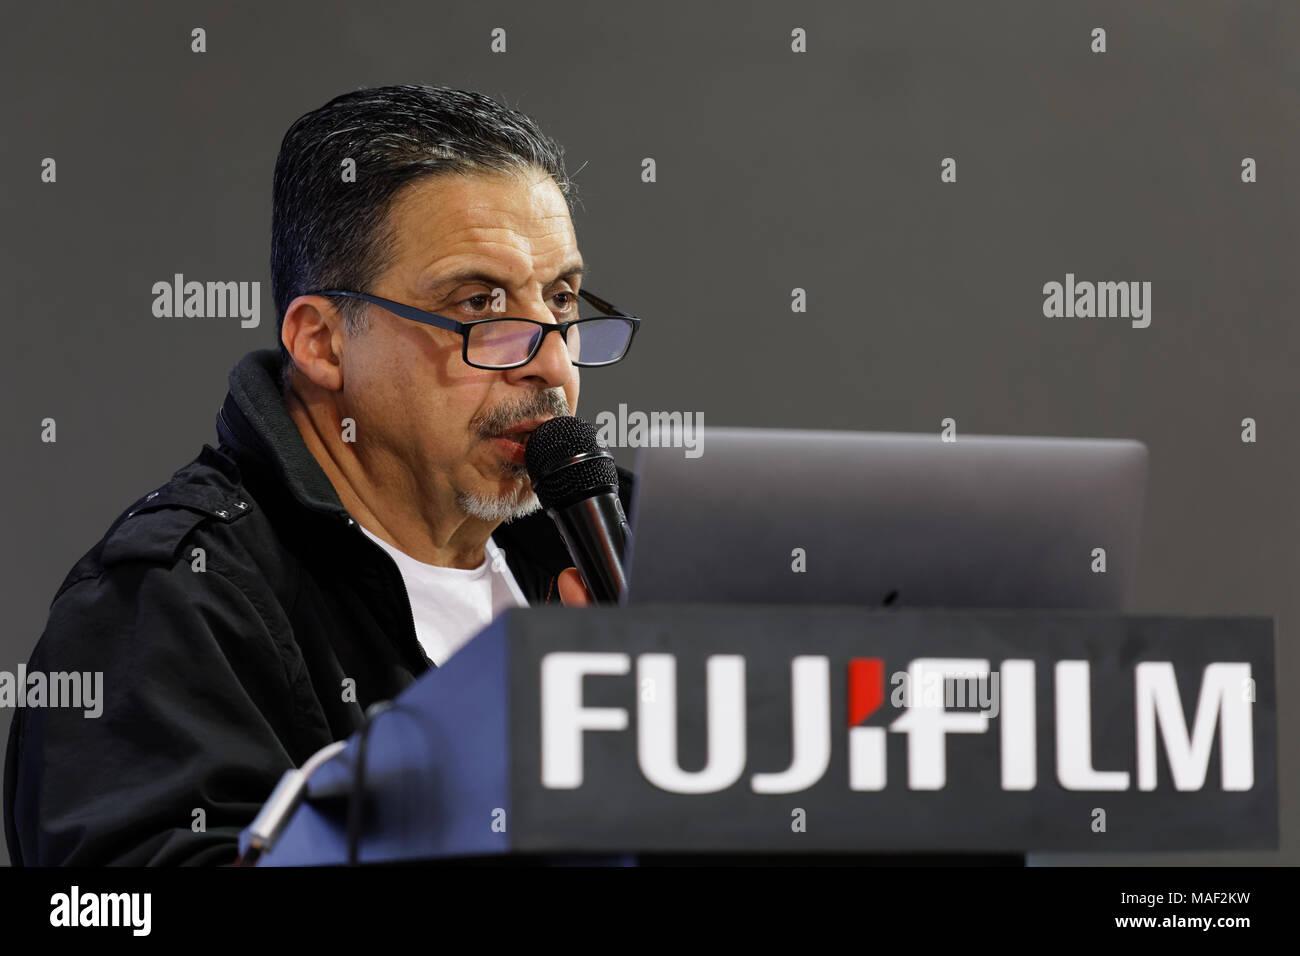 Photographer Georgy Pinkhasov attends the presentation new camera of Fujifilm - Stock Image